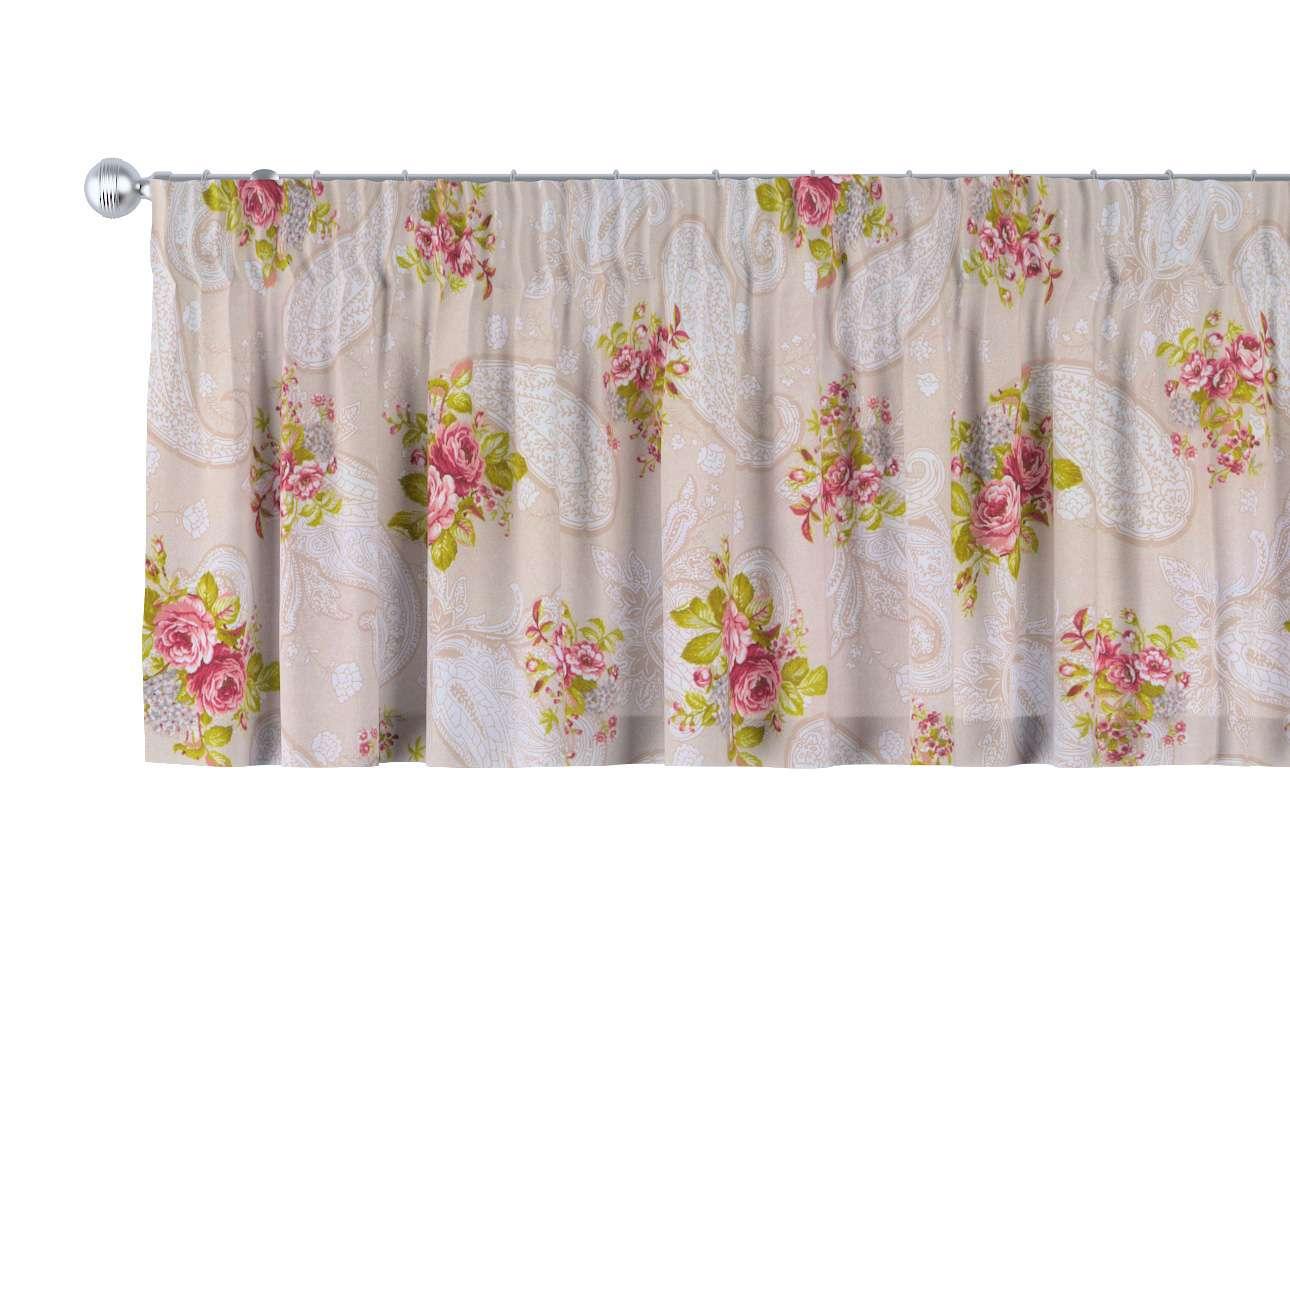 Gardinkappa med rynkband 130 x 40 cm i kollektionen Flowers, Tyg: 311-15